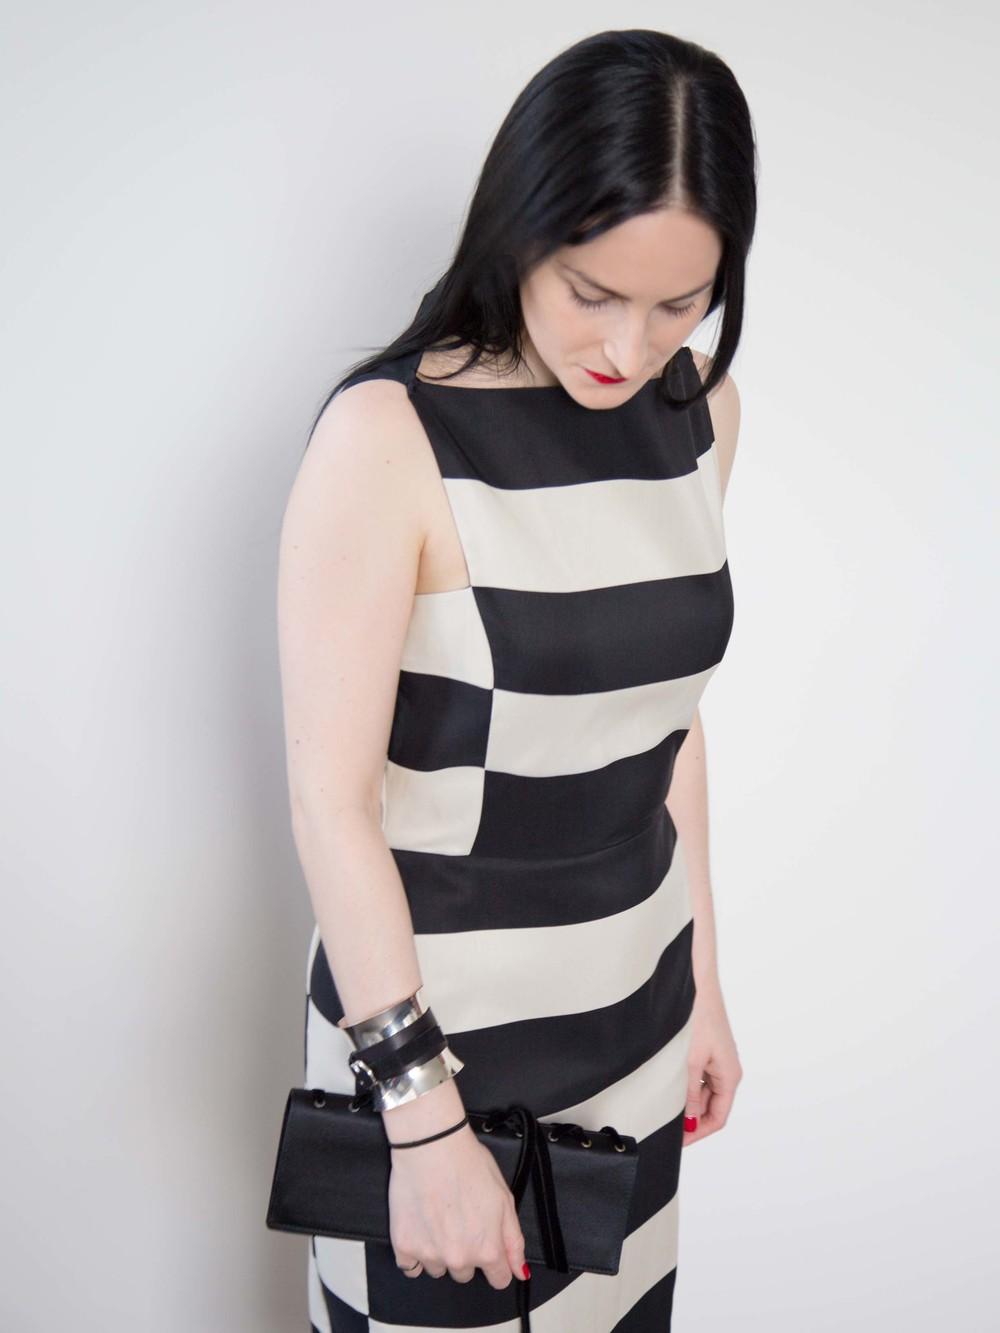 Lanvin Striped Dress, Georg Jensen Cuff, Yves Saint Laurent Vintage Clutch, Cartier Love Ring